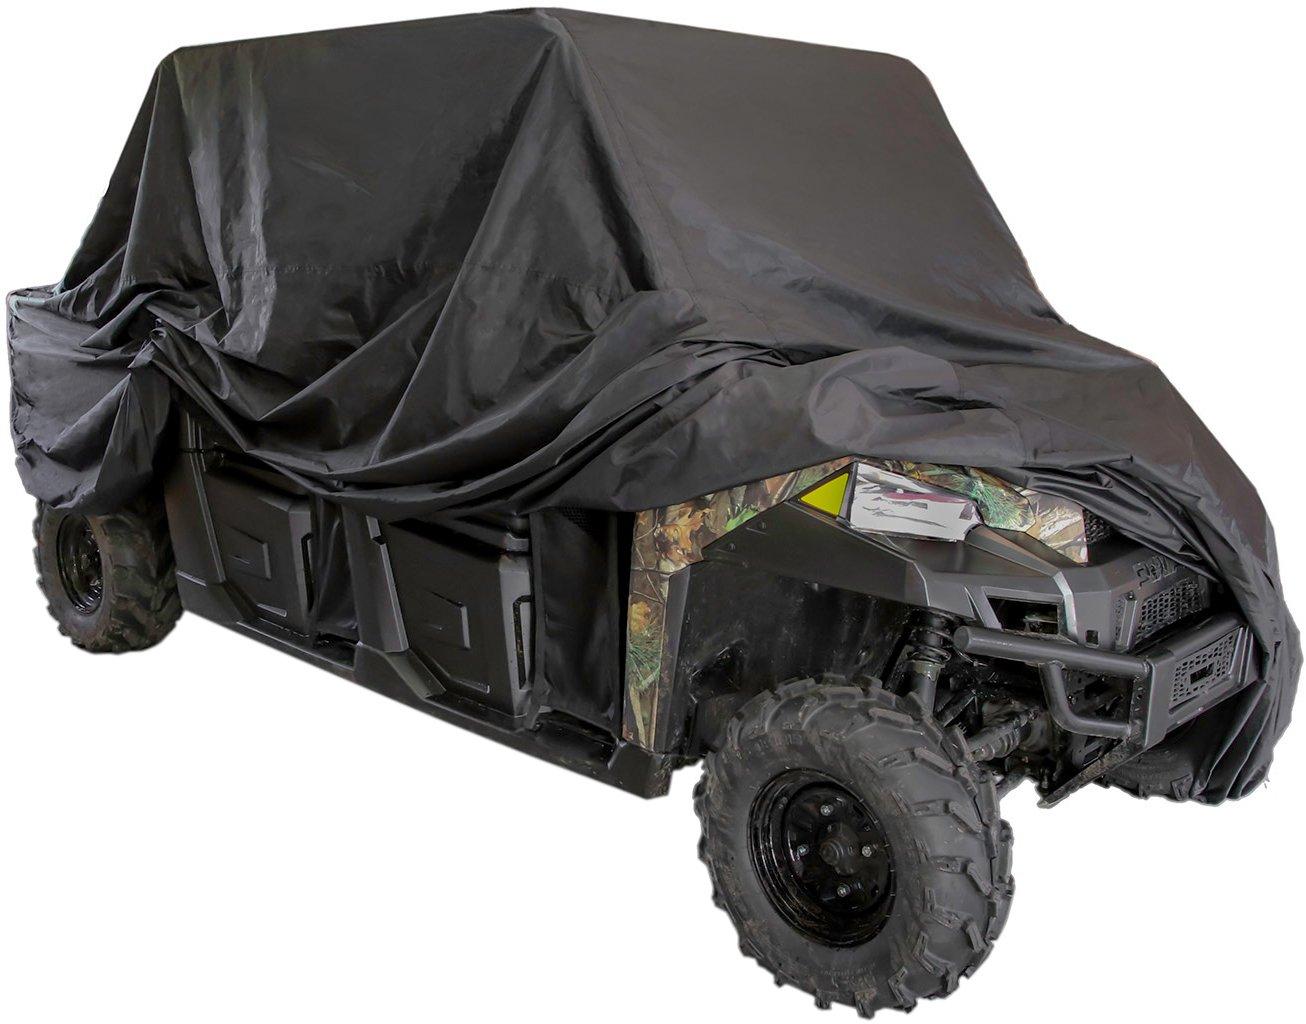 Raider 02-7725 SX-Series Weather and UV-Resistant UTV 2-Row Seating Storage Cover by Raider